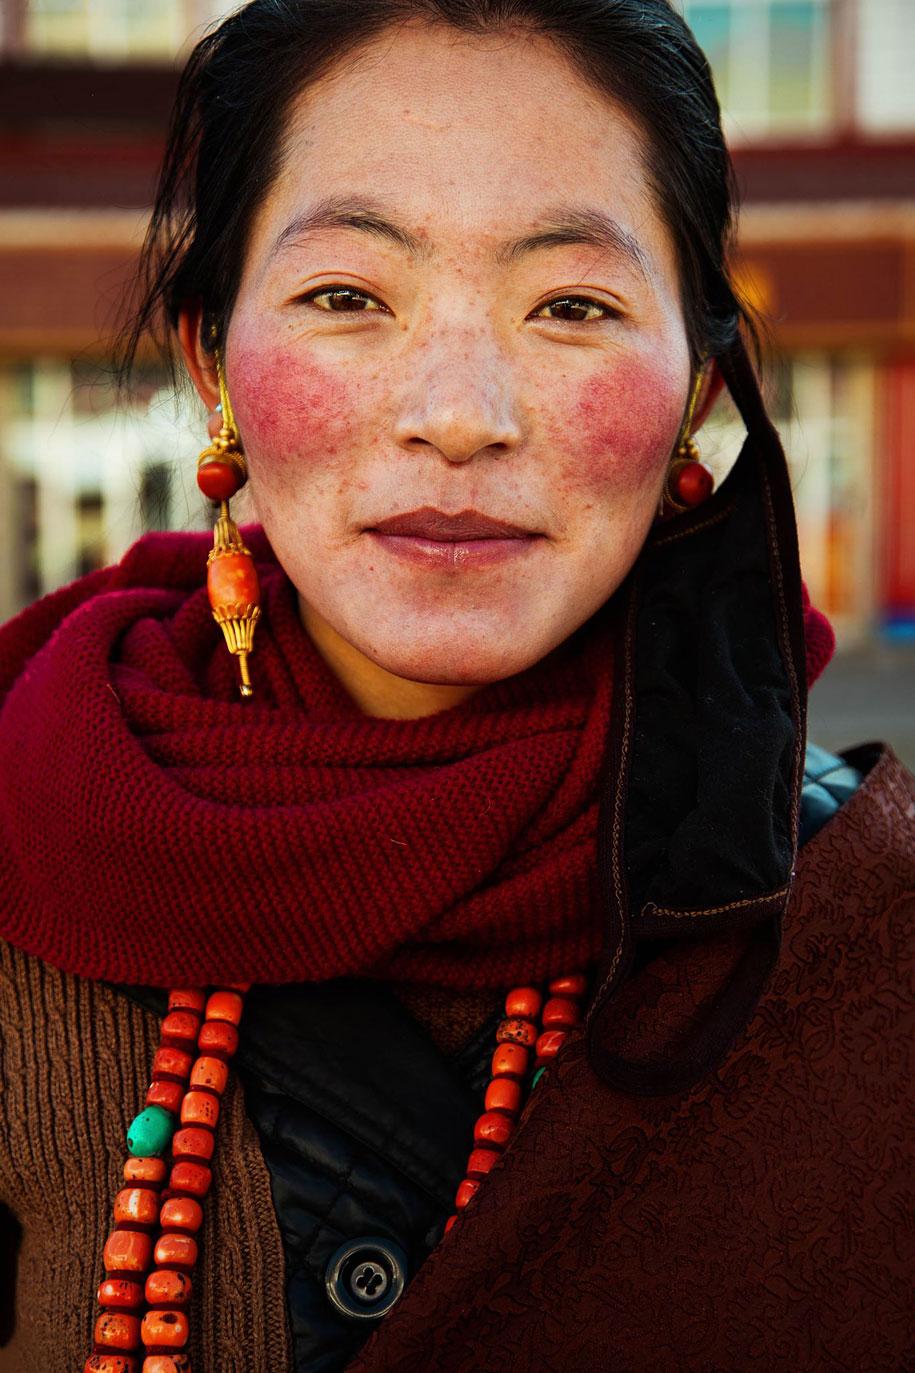 women-around-world-atlas-beauty-mihaela-noroc-11